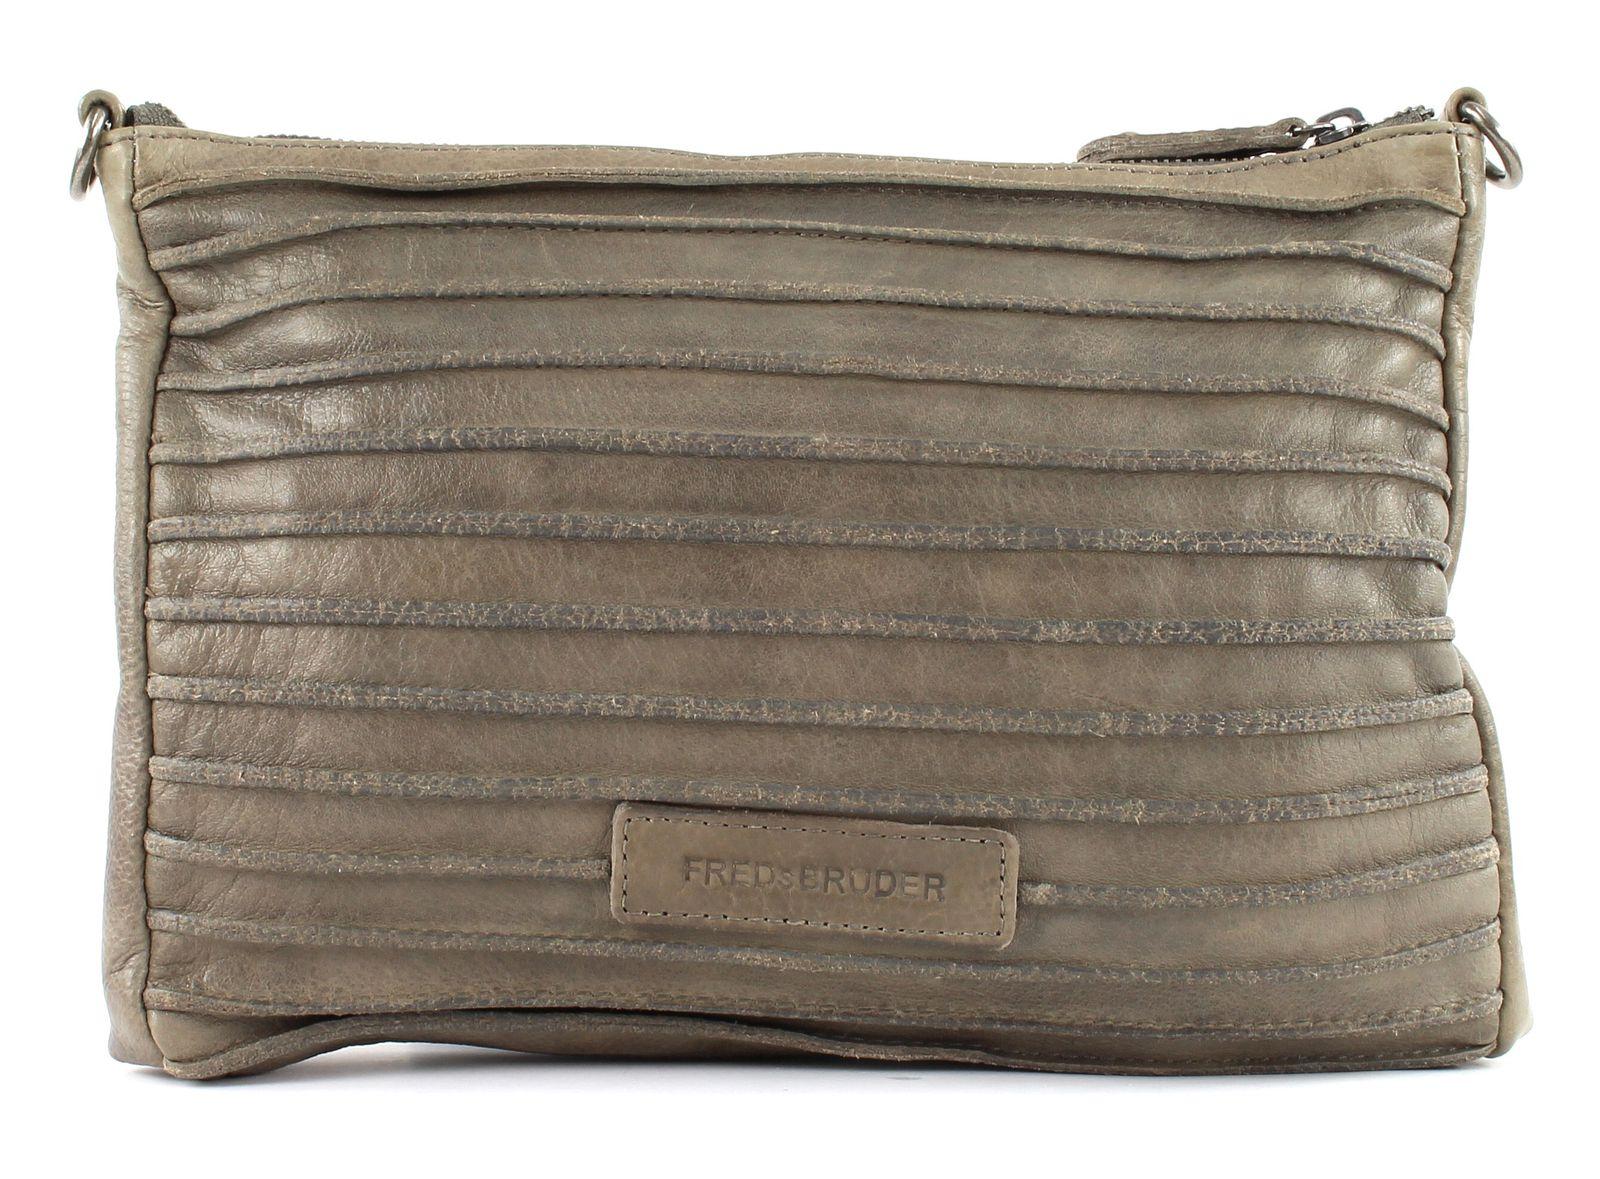 Fredsbruder Spotlight Shiny Wallet Geldbörse Rose Gold Kupfer Neu Kleidung & Accessoires